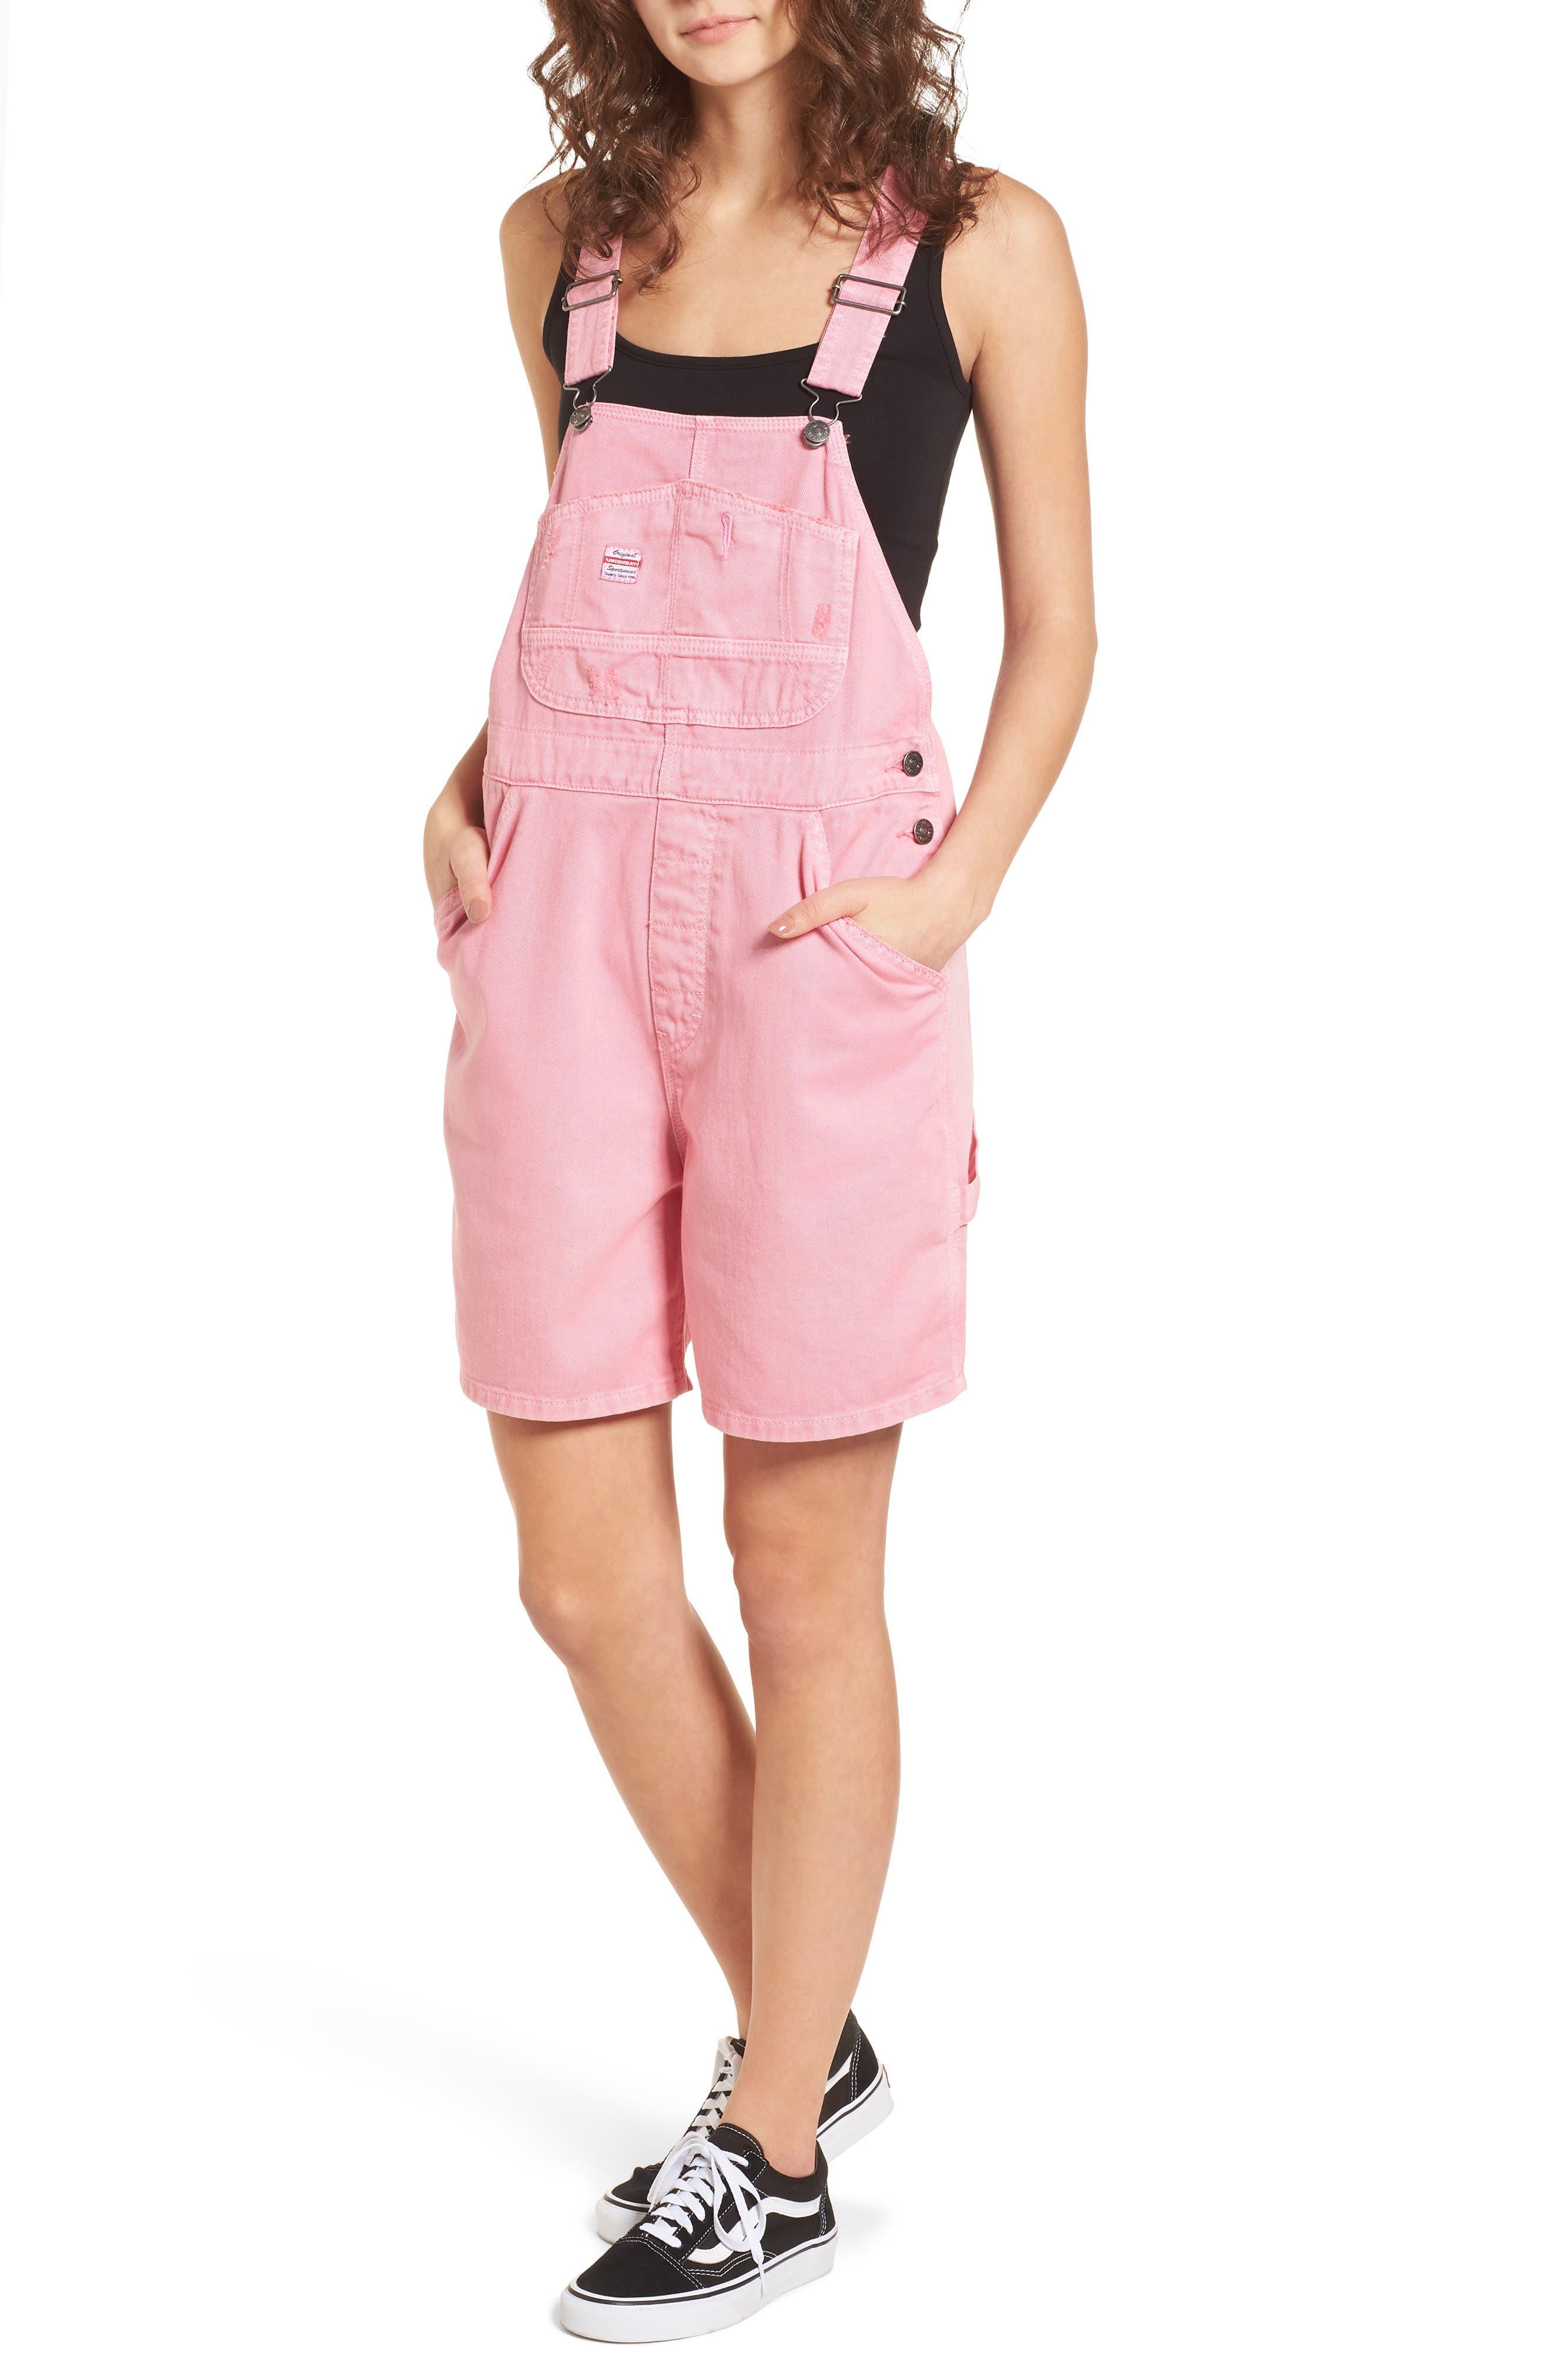 Unionbay Mario Denim Shortalls,                             Main thumbnail 1, color,                             Popsicle Pink